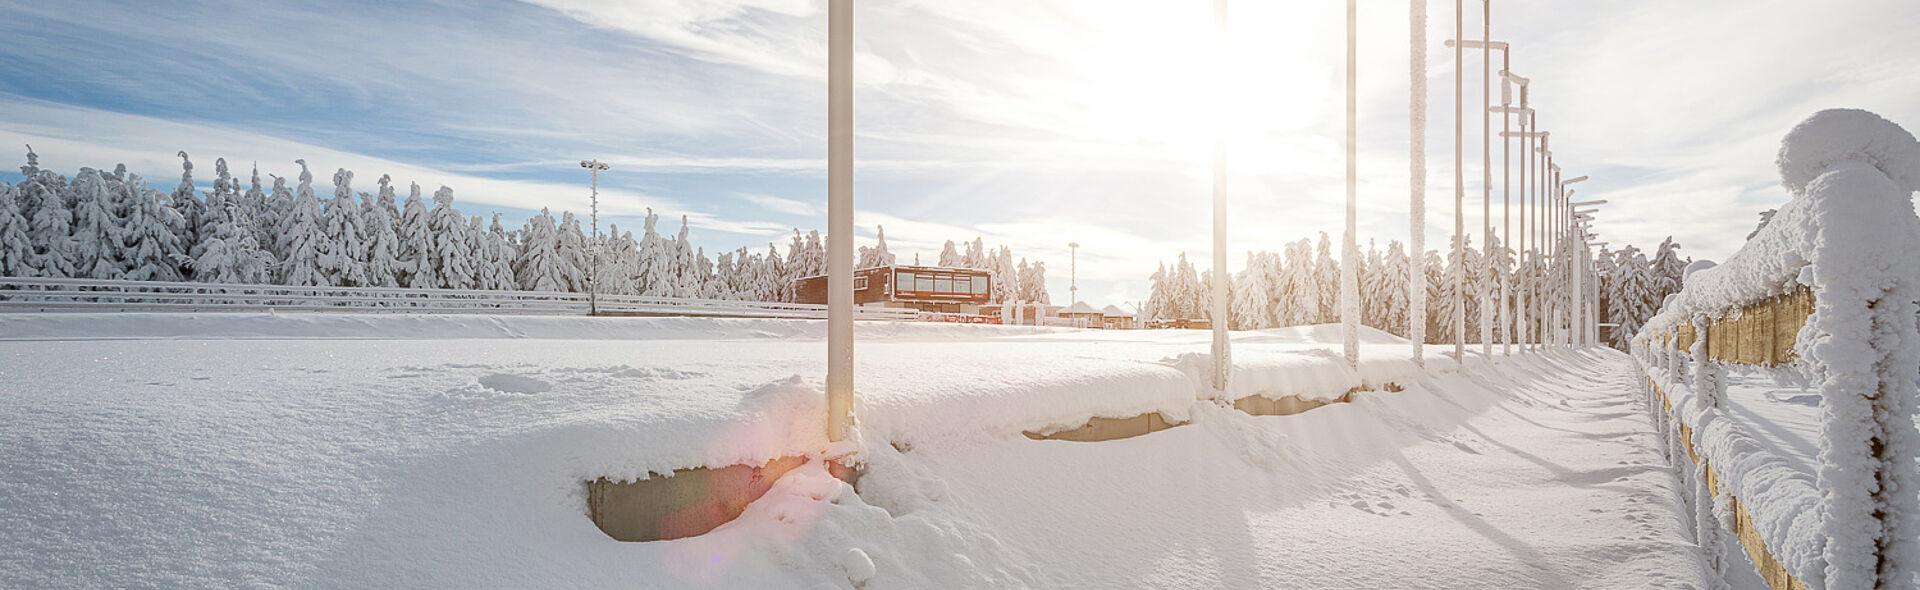 Skilanglauf Biathlon Nordische Kombination Trainingszentrum TrainingCenter Oberwiesenthal Fichtelberg Loipe